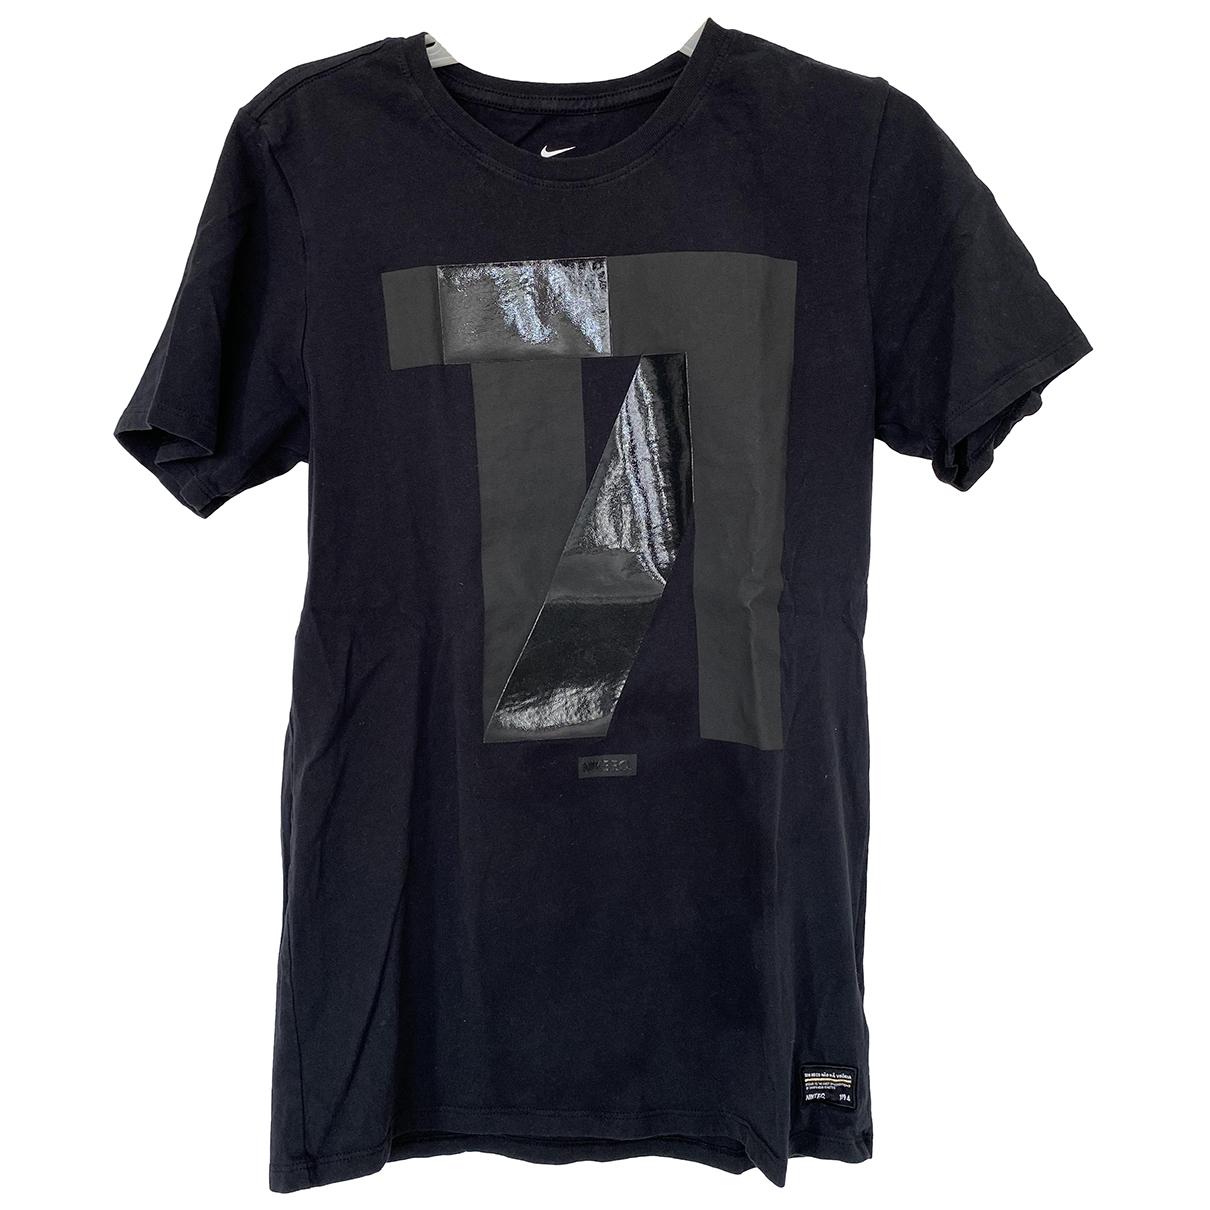 Nike \N T-Shirts in  Schwarz Baumwolle